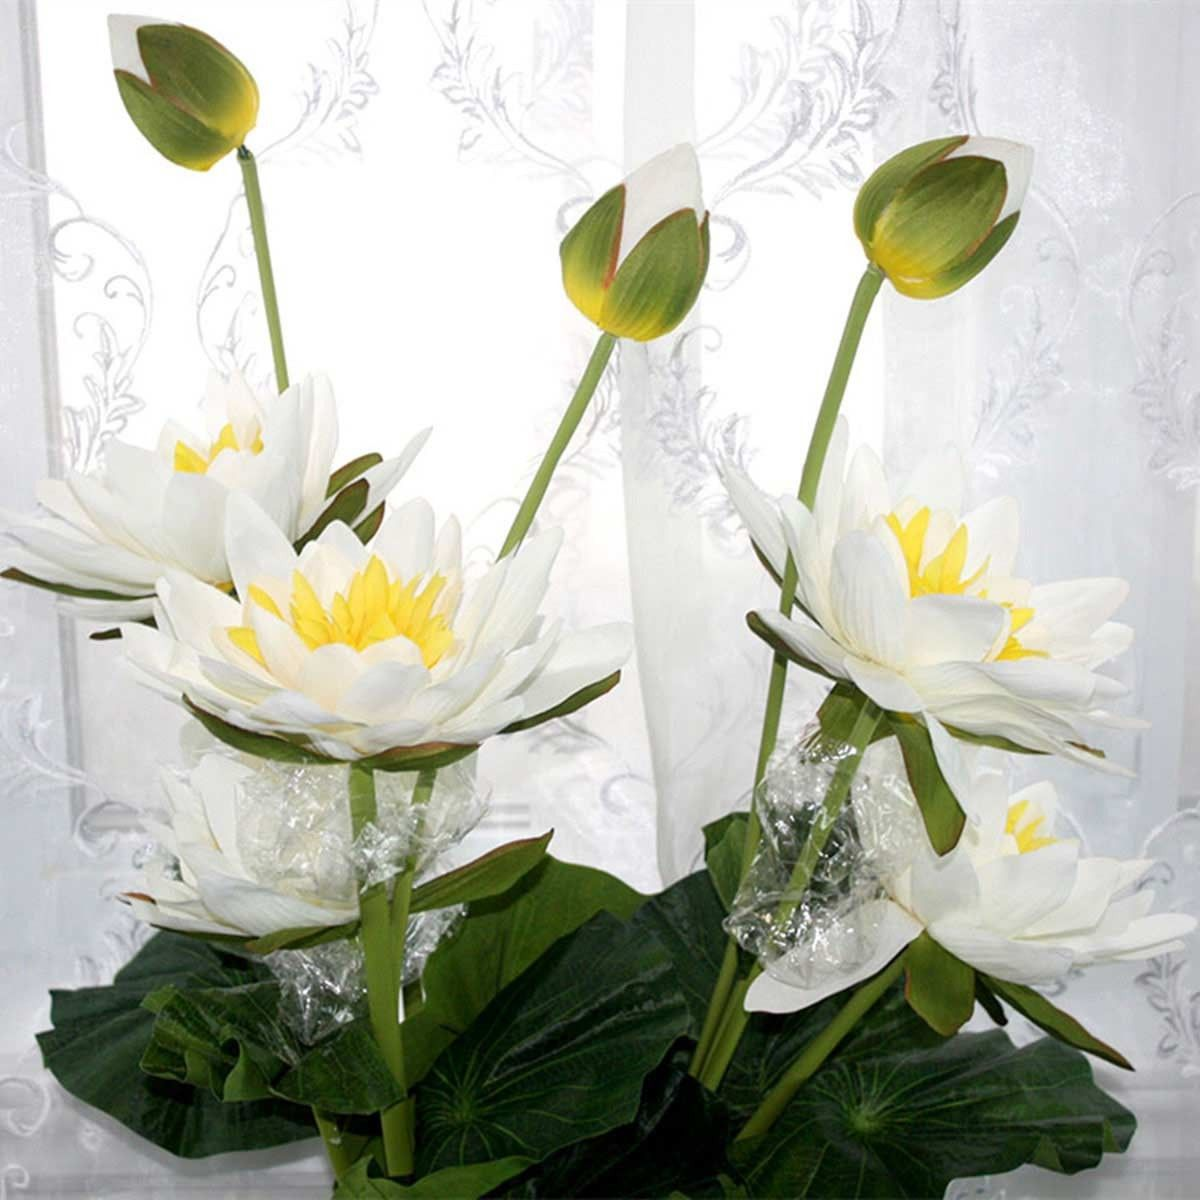 Artificial Lotus Flower Gallery Flower Wallpaper Hd